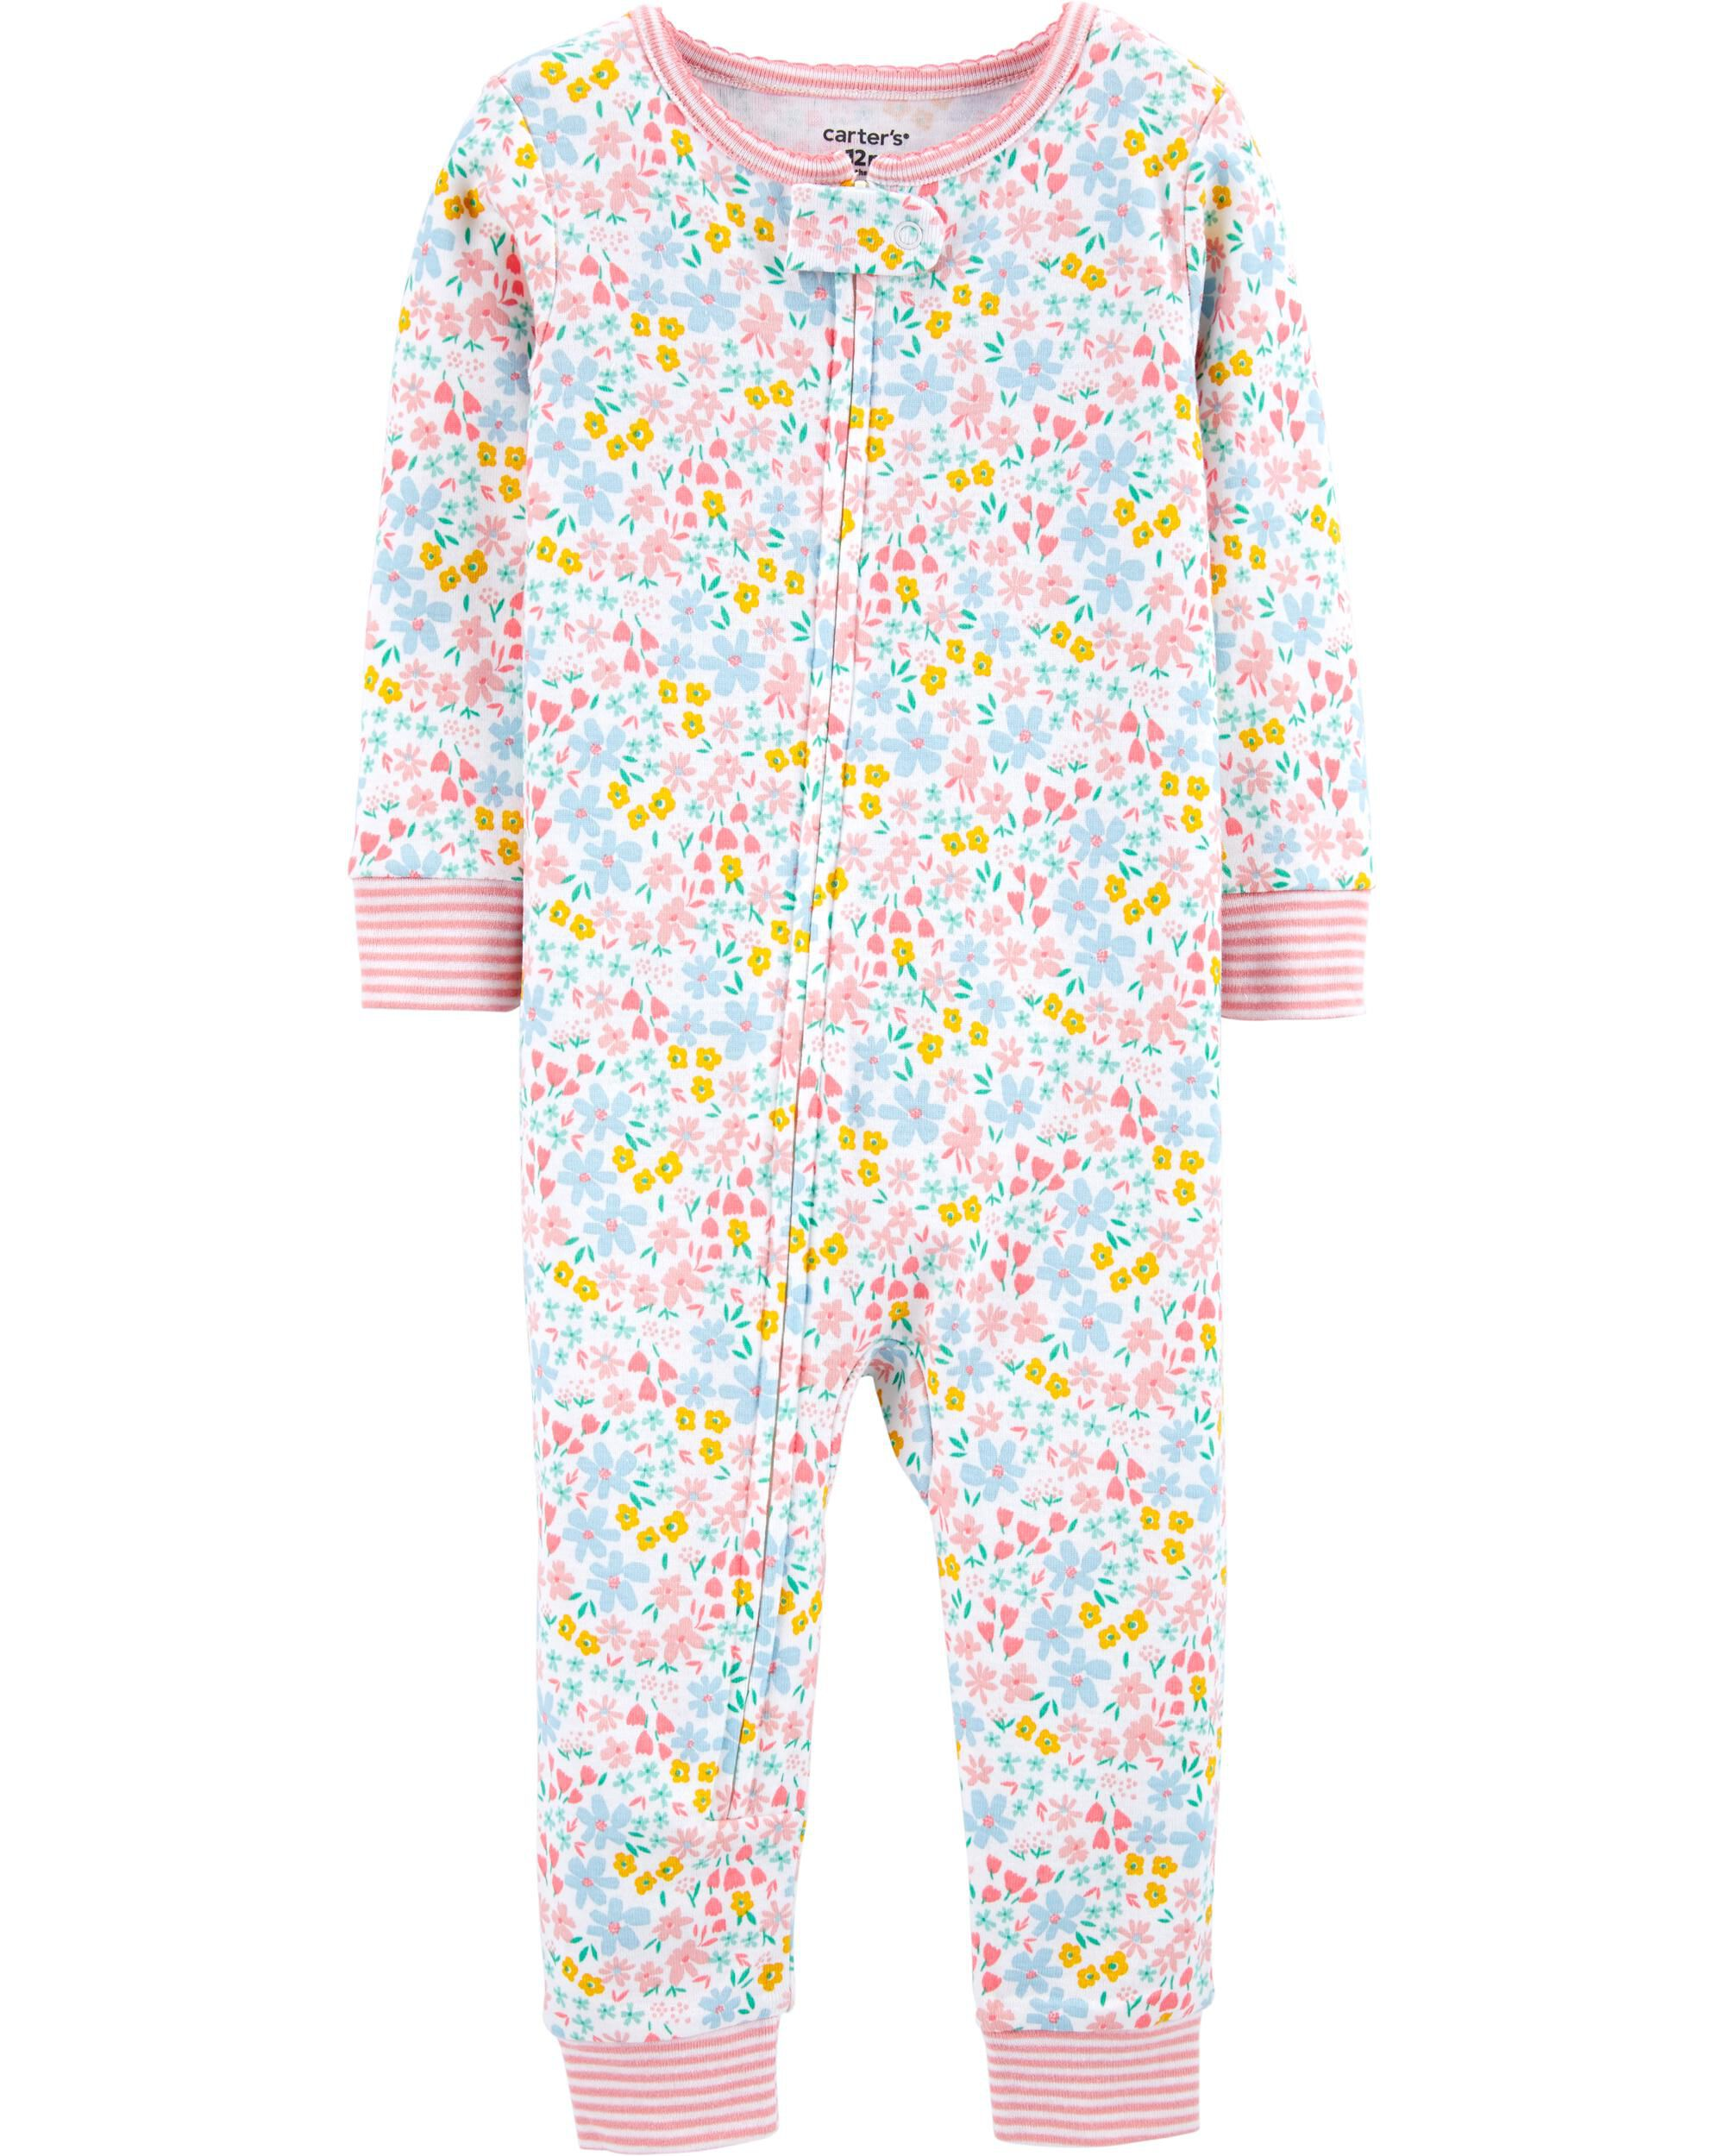 1-Piece 100% Snug Fit Cotton Footless PJs